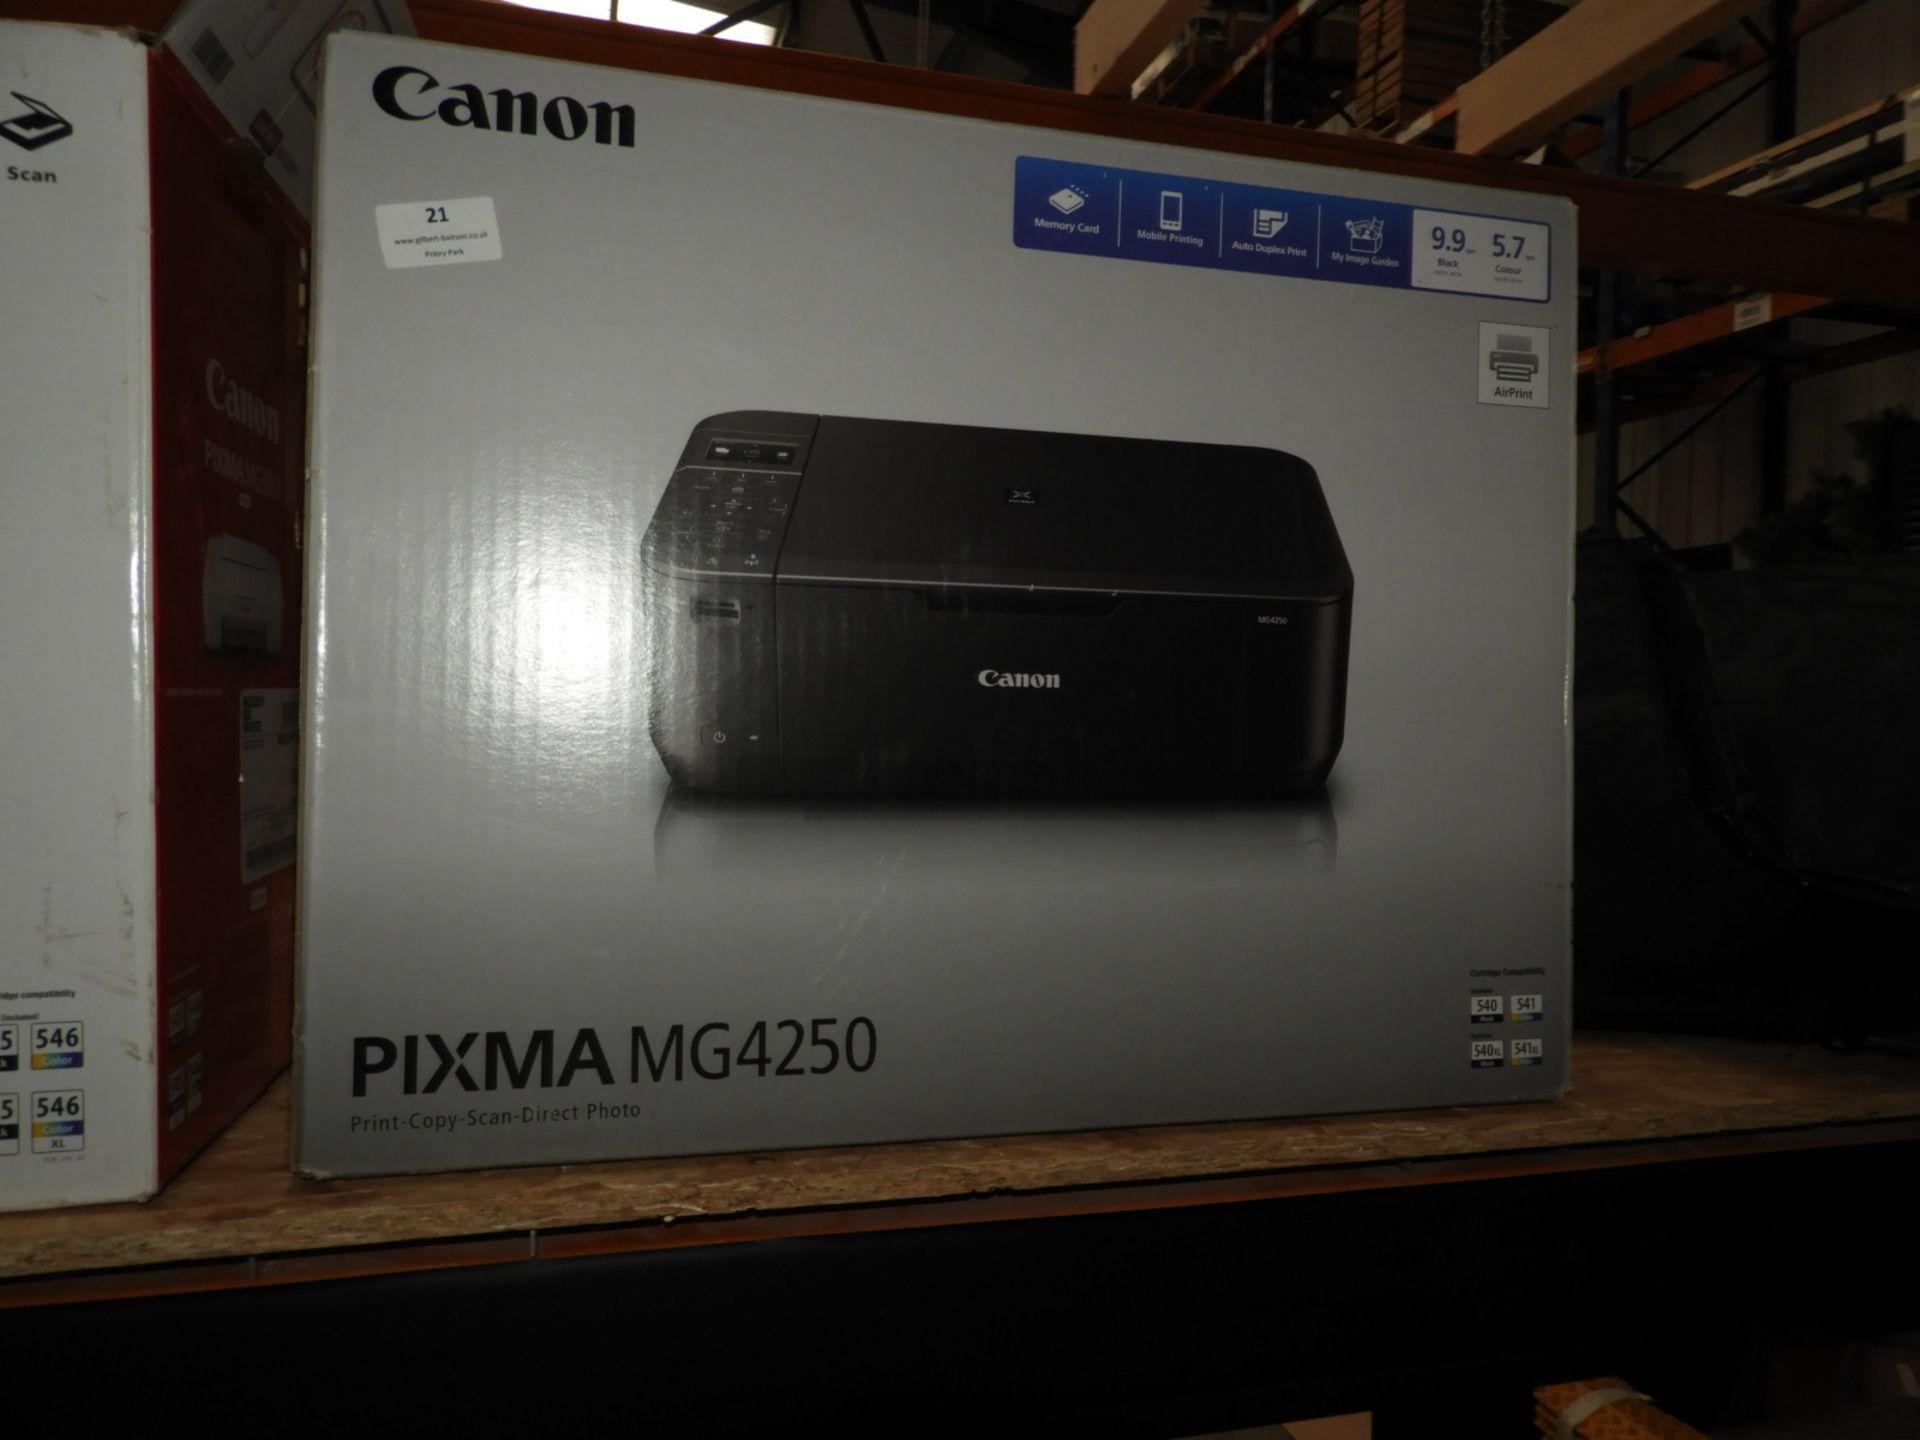 Lot 21 - *Canon Pixma MG4250 Printer